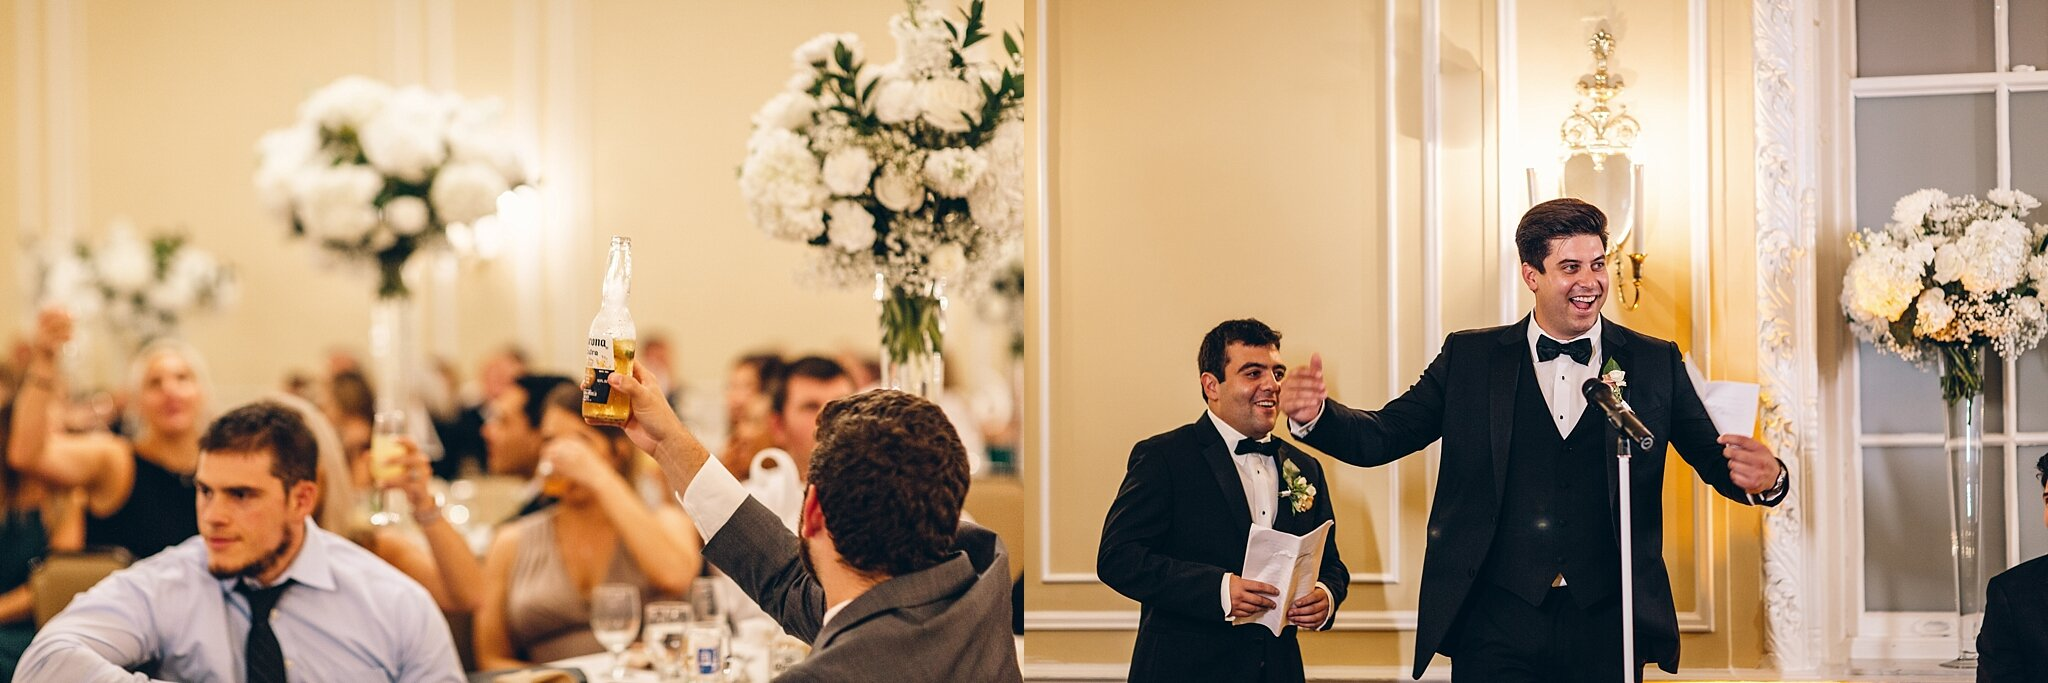 patrick-henry-ballroom-wedding-roanoke_0535.jpg